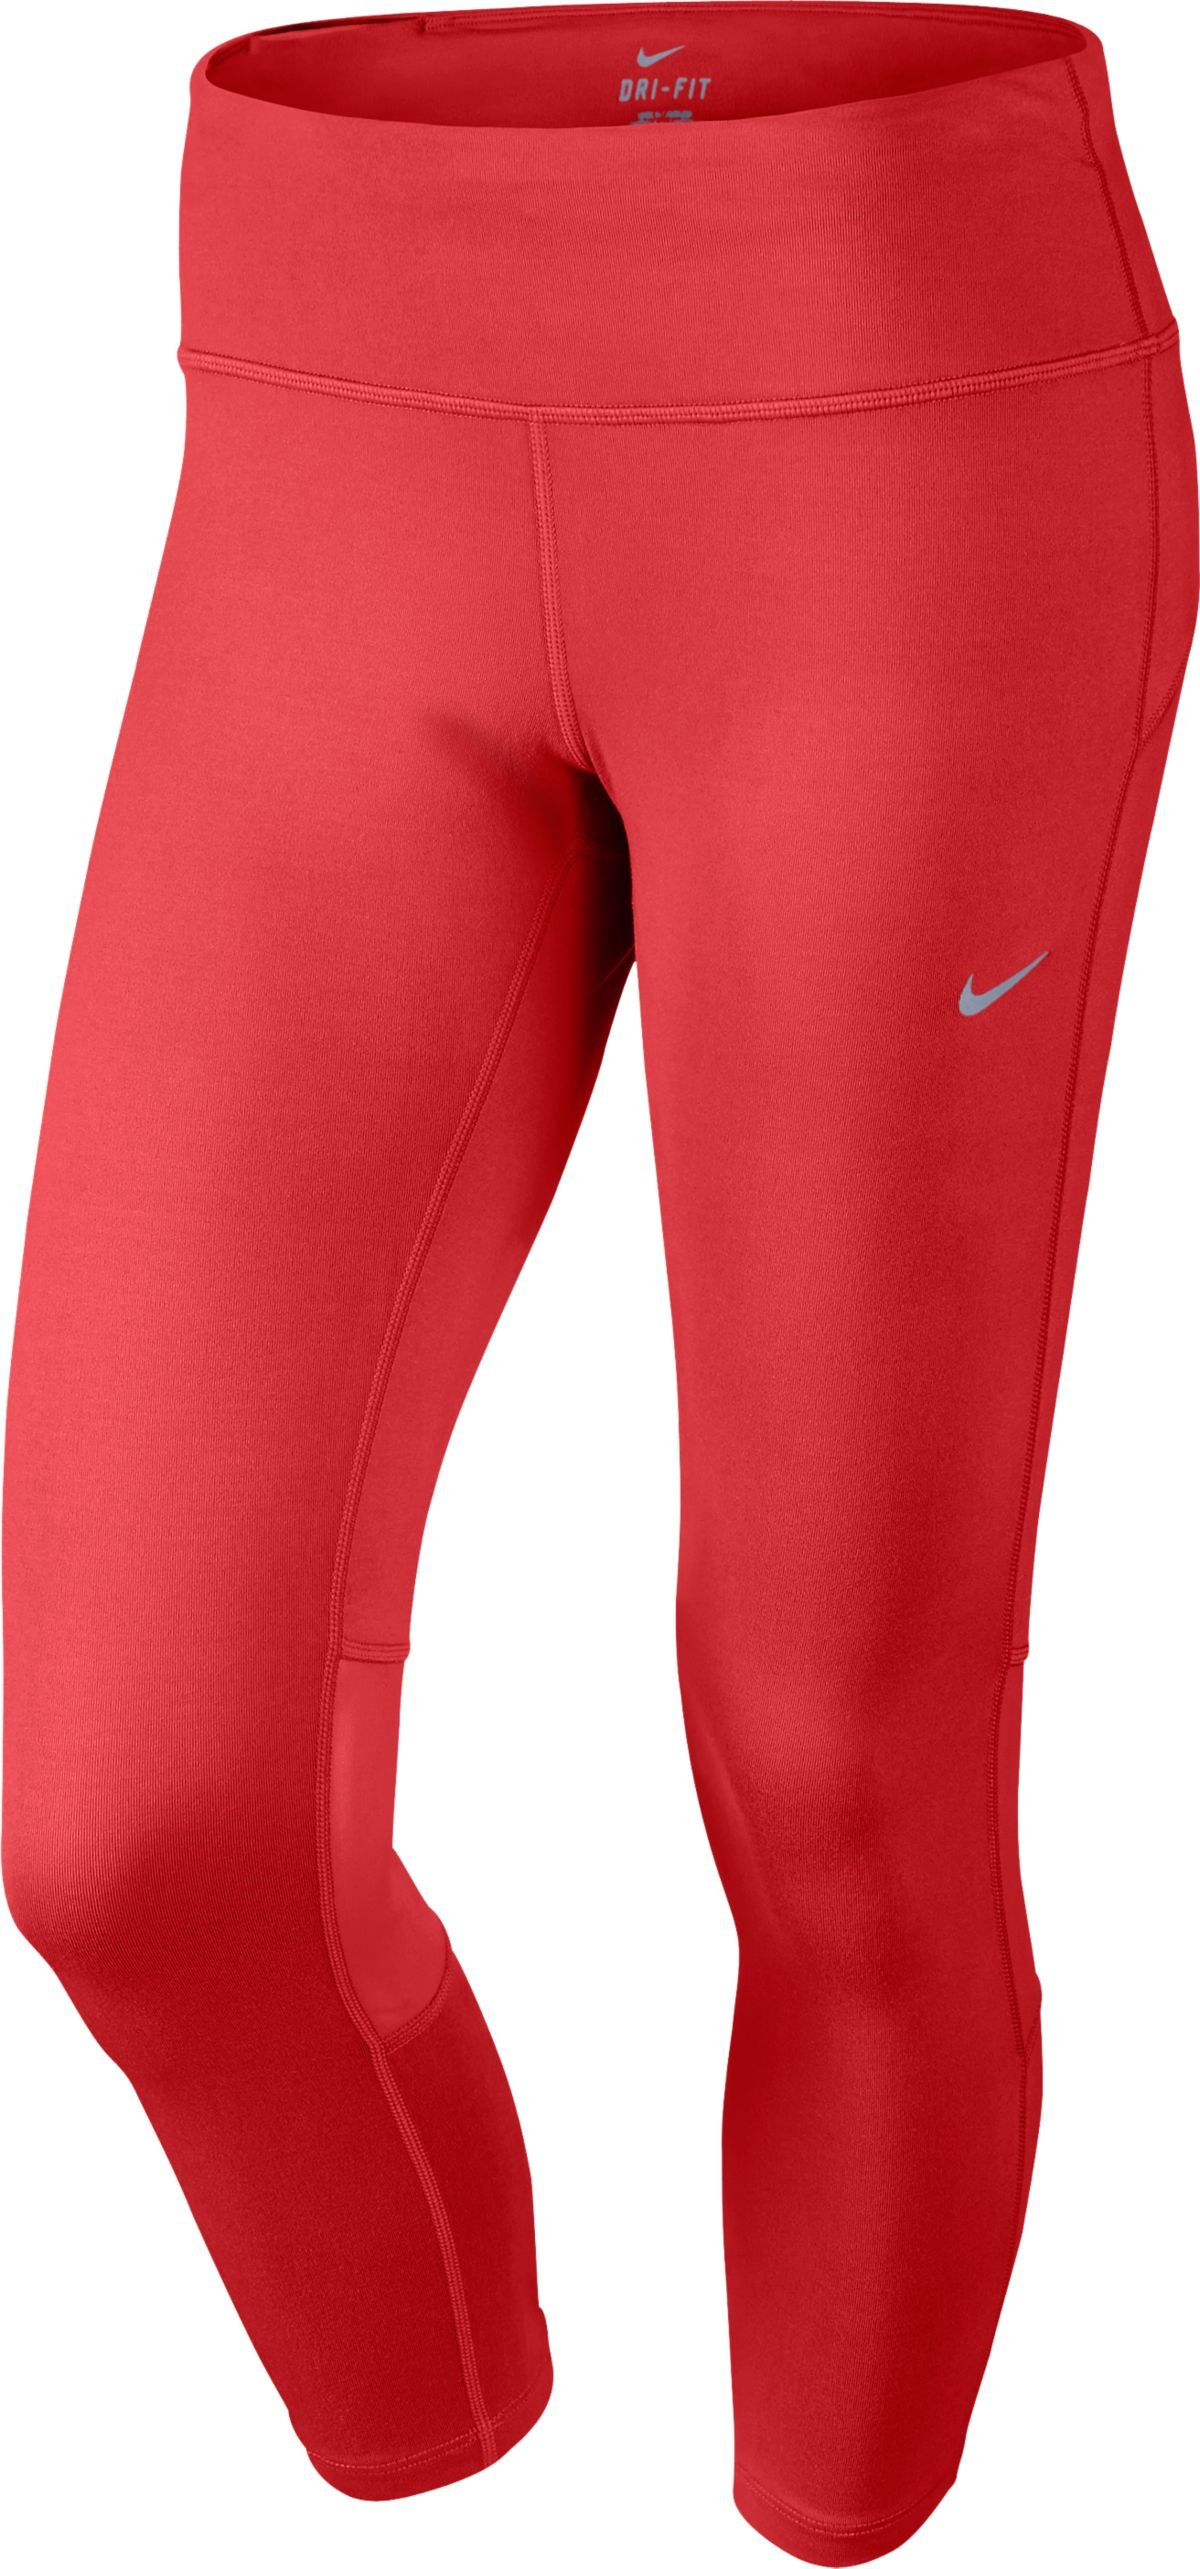 Kalhoty 3/4 Nike DF EPIC RUN CROP